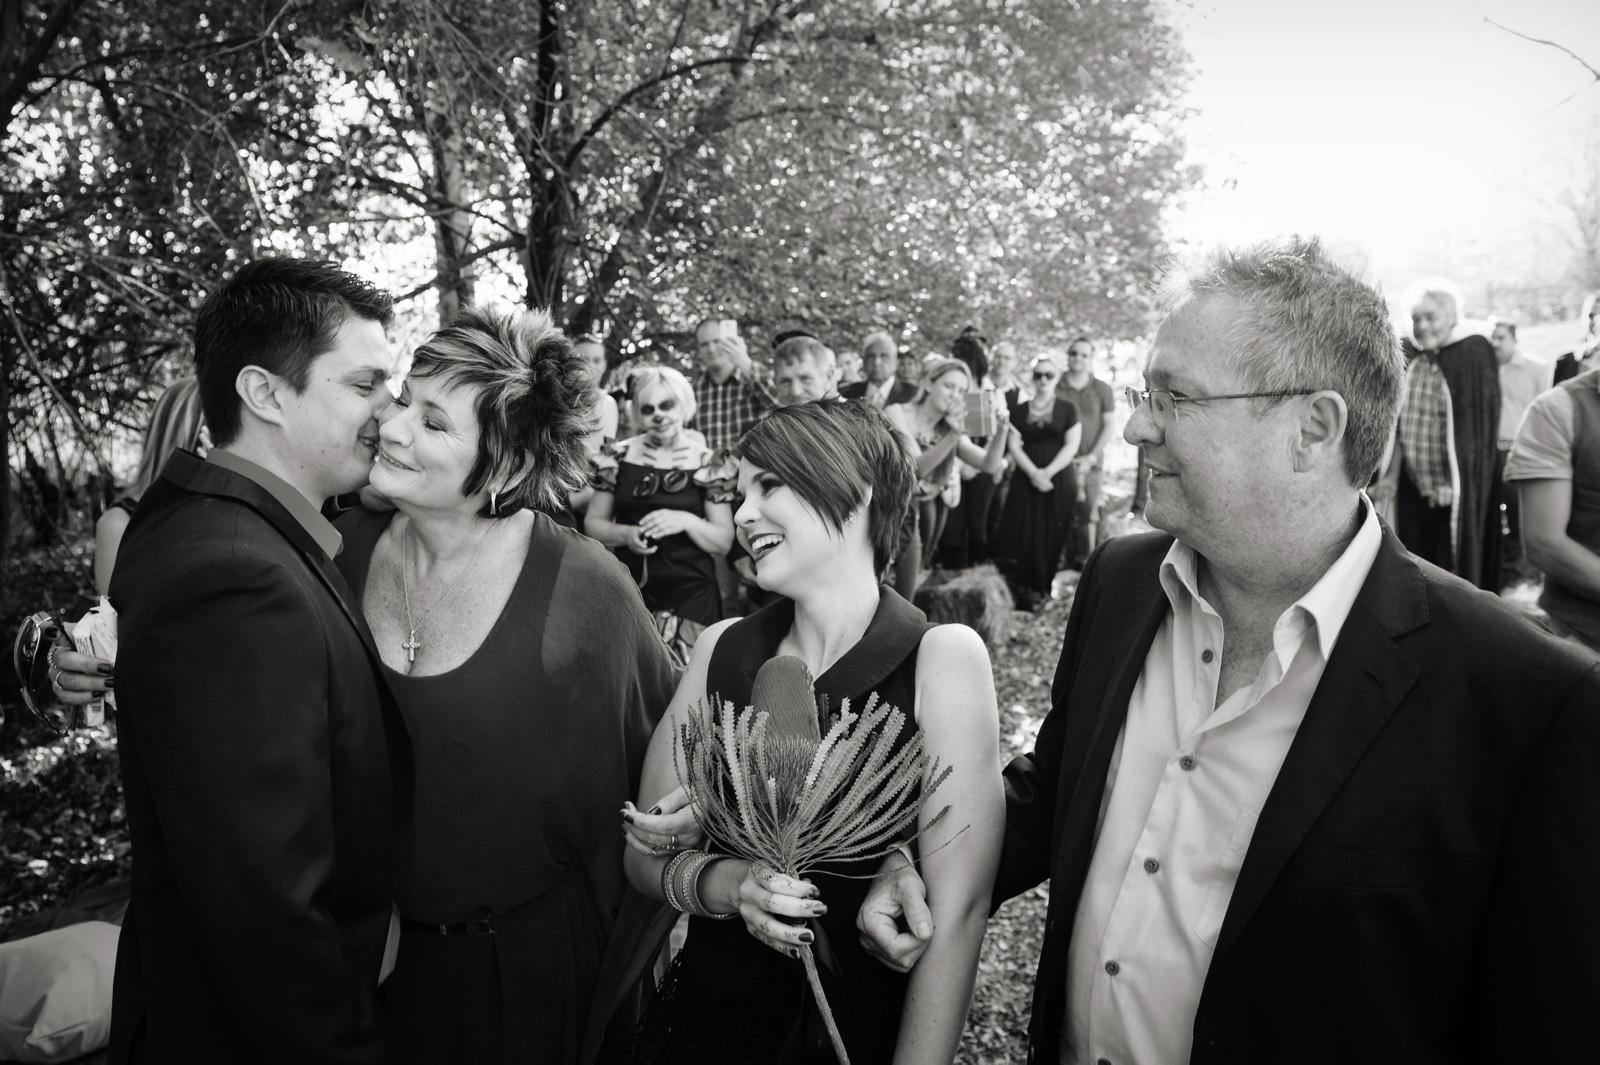 bride in black dress with groom